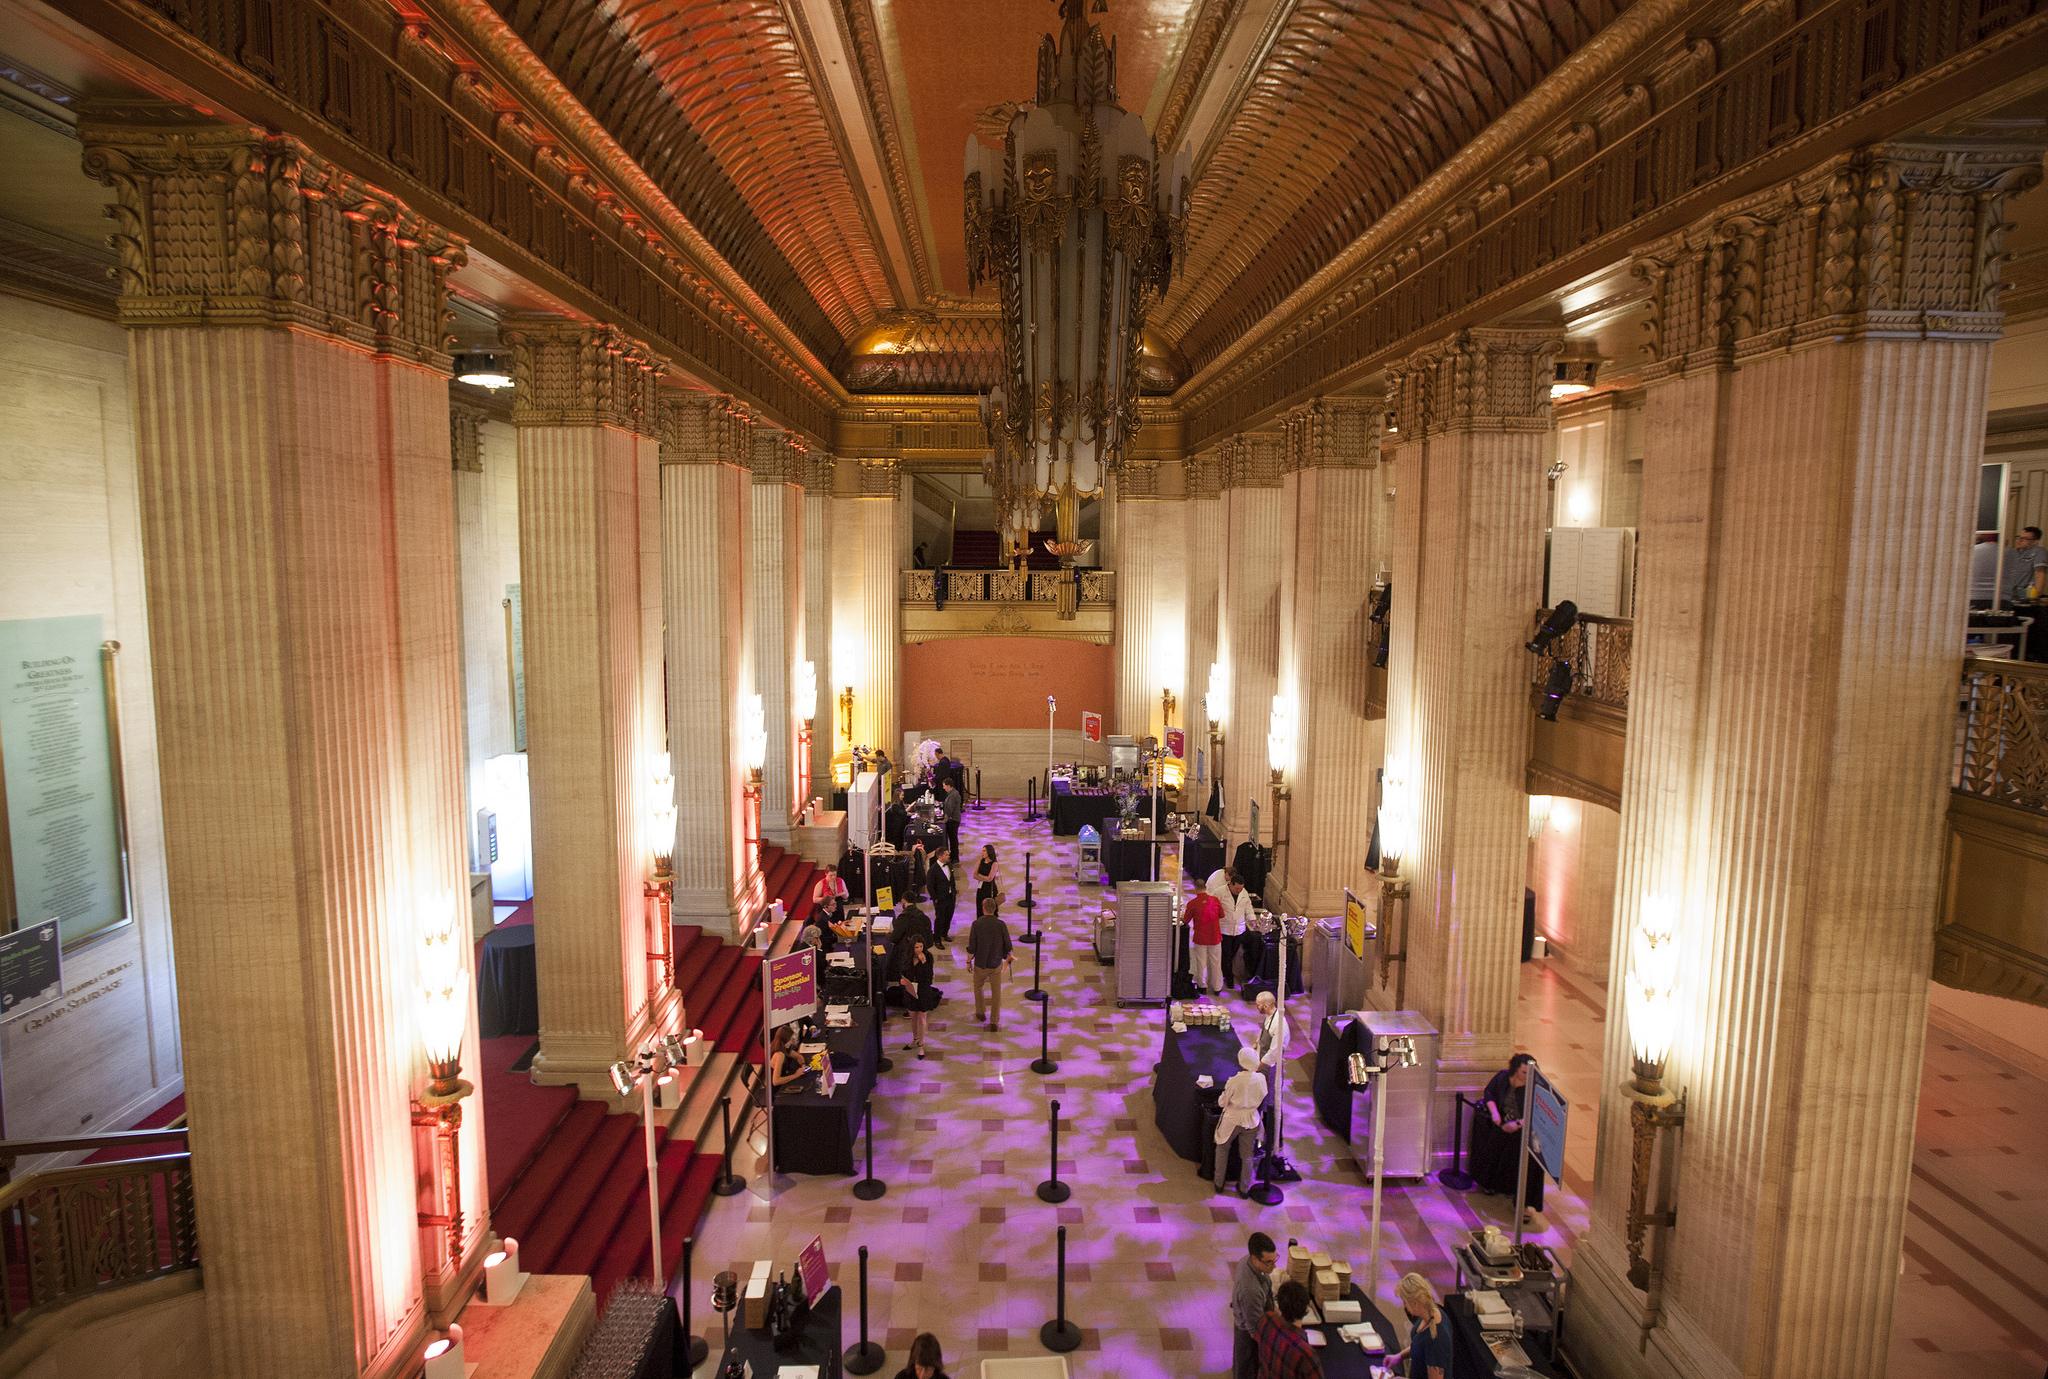 Inside the Lyric Opera House